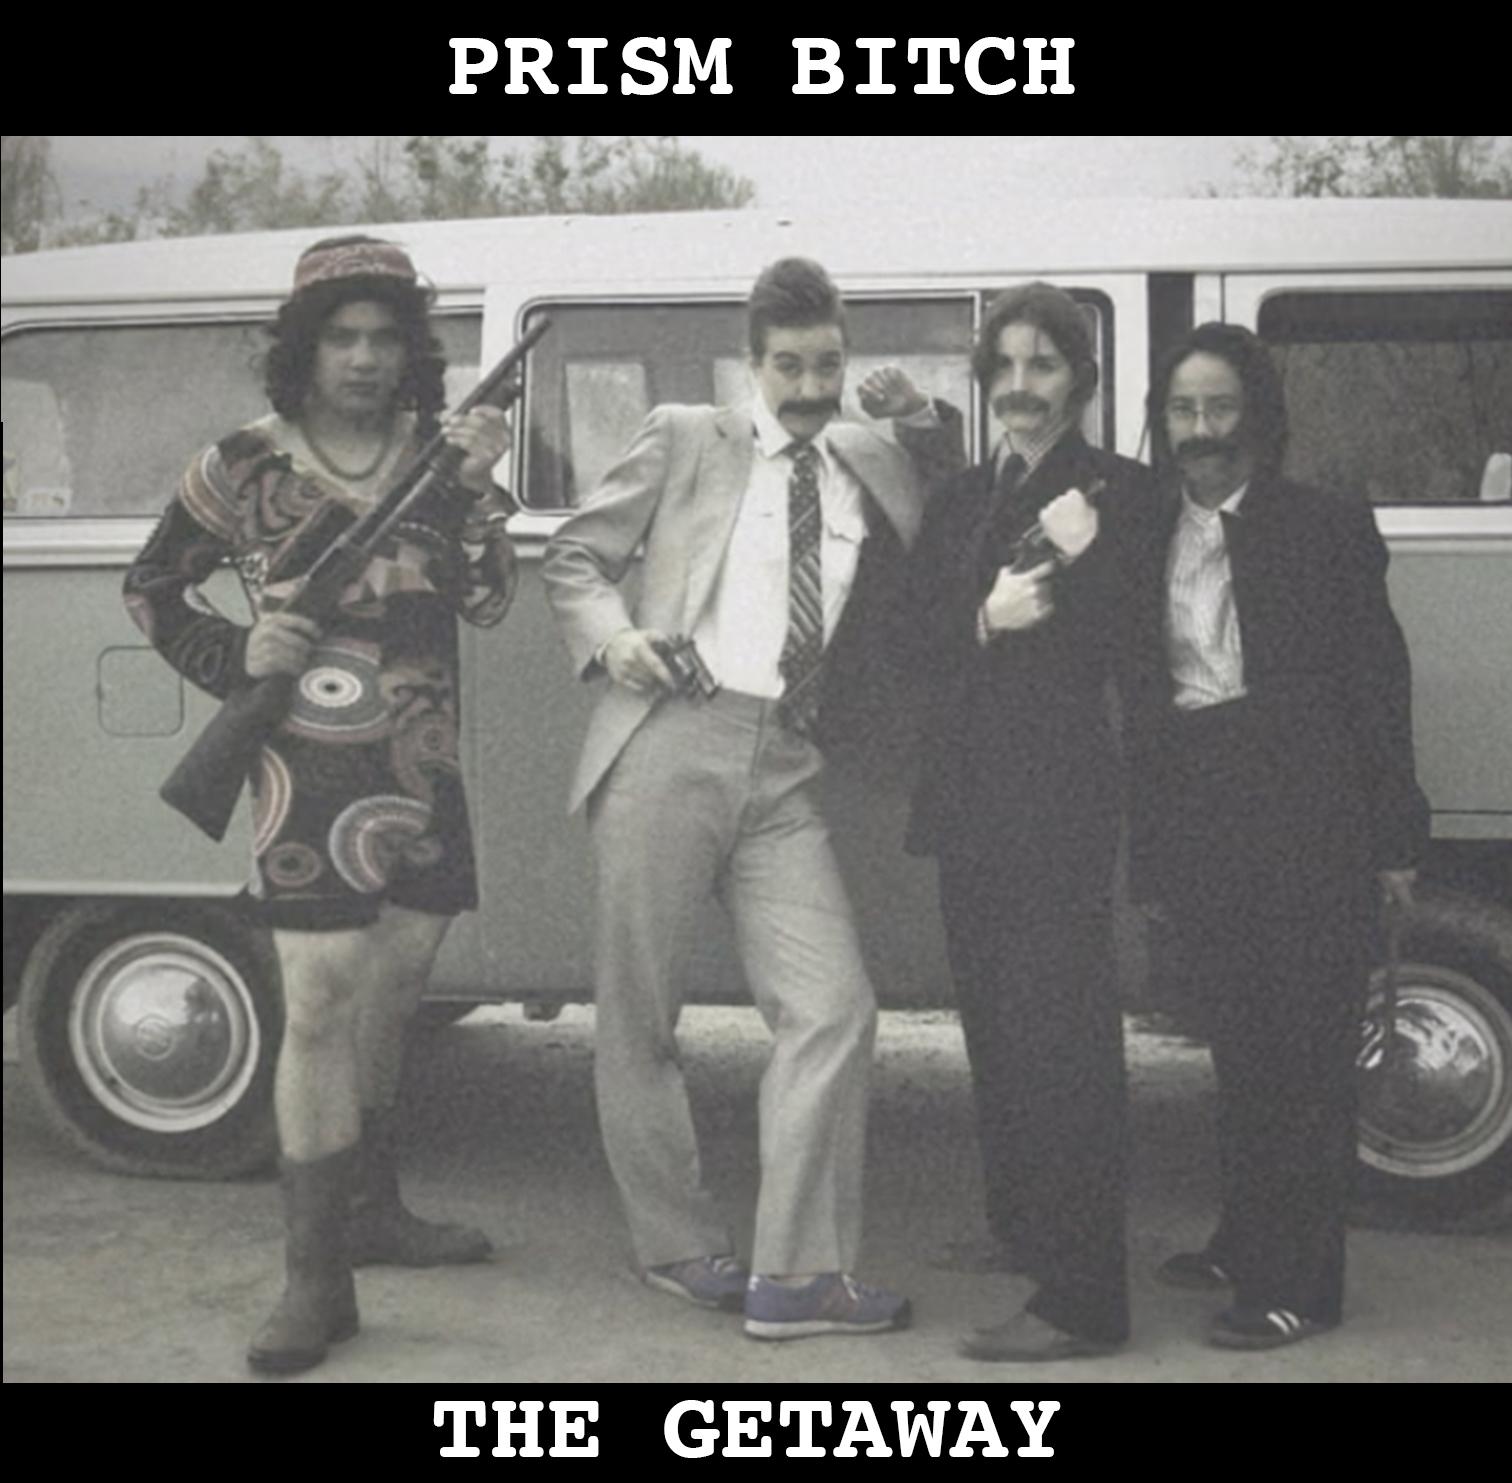 Prism Bitch - The Getaway